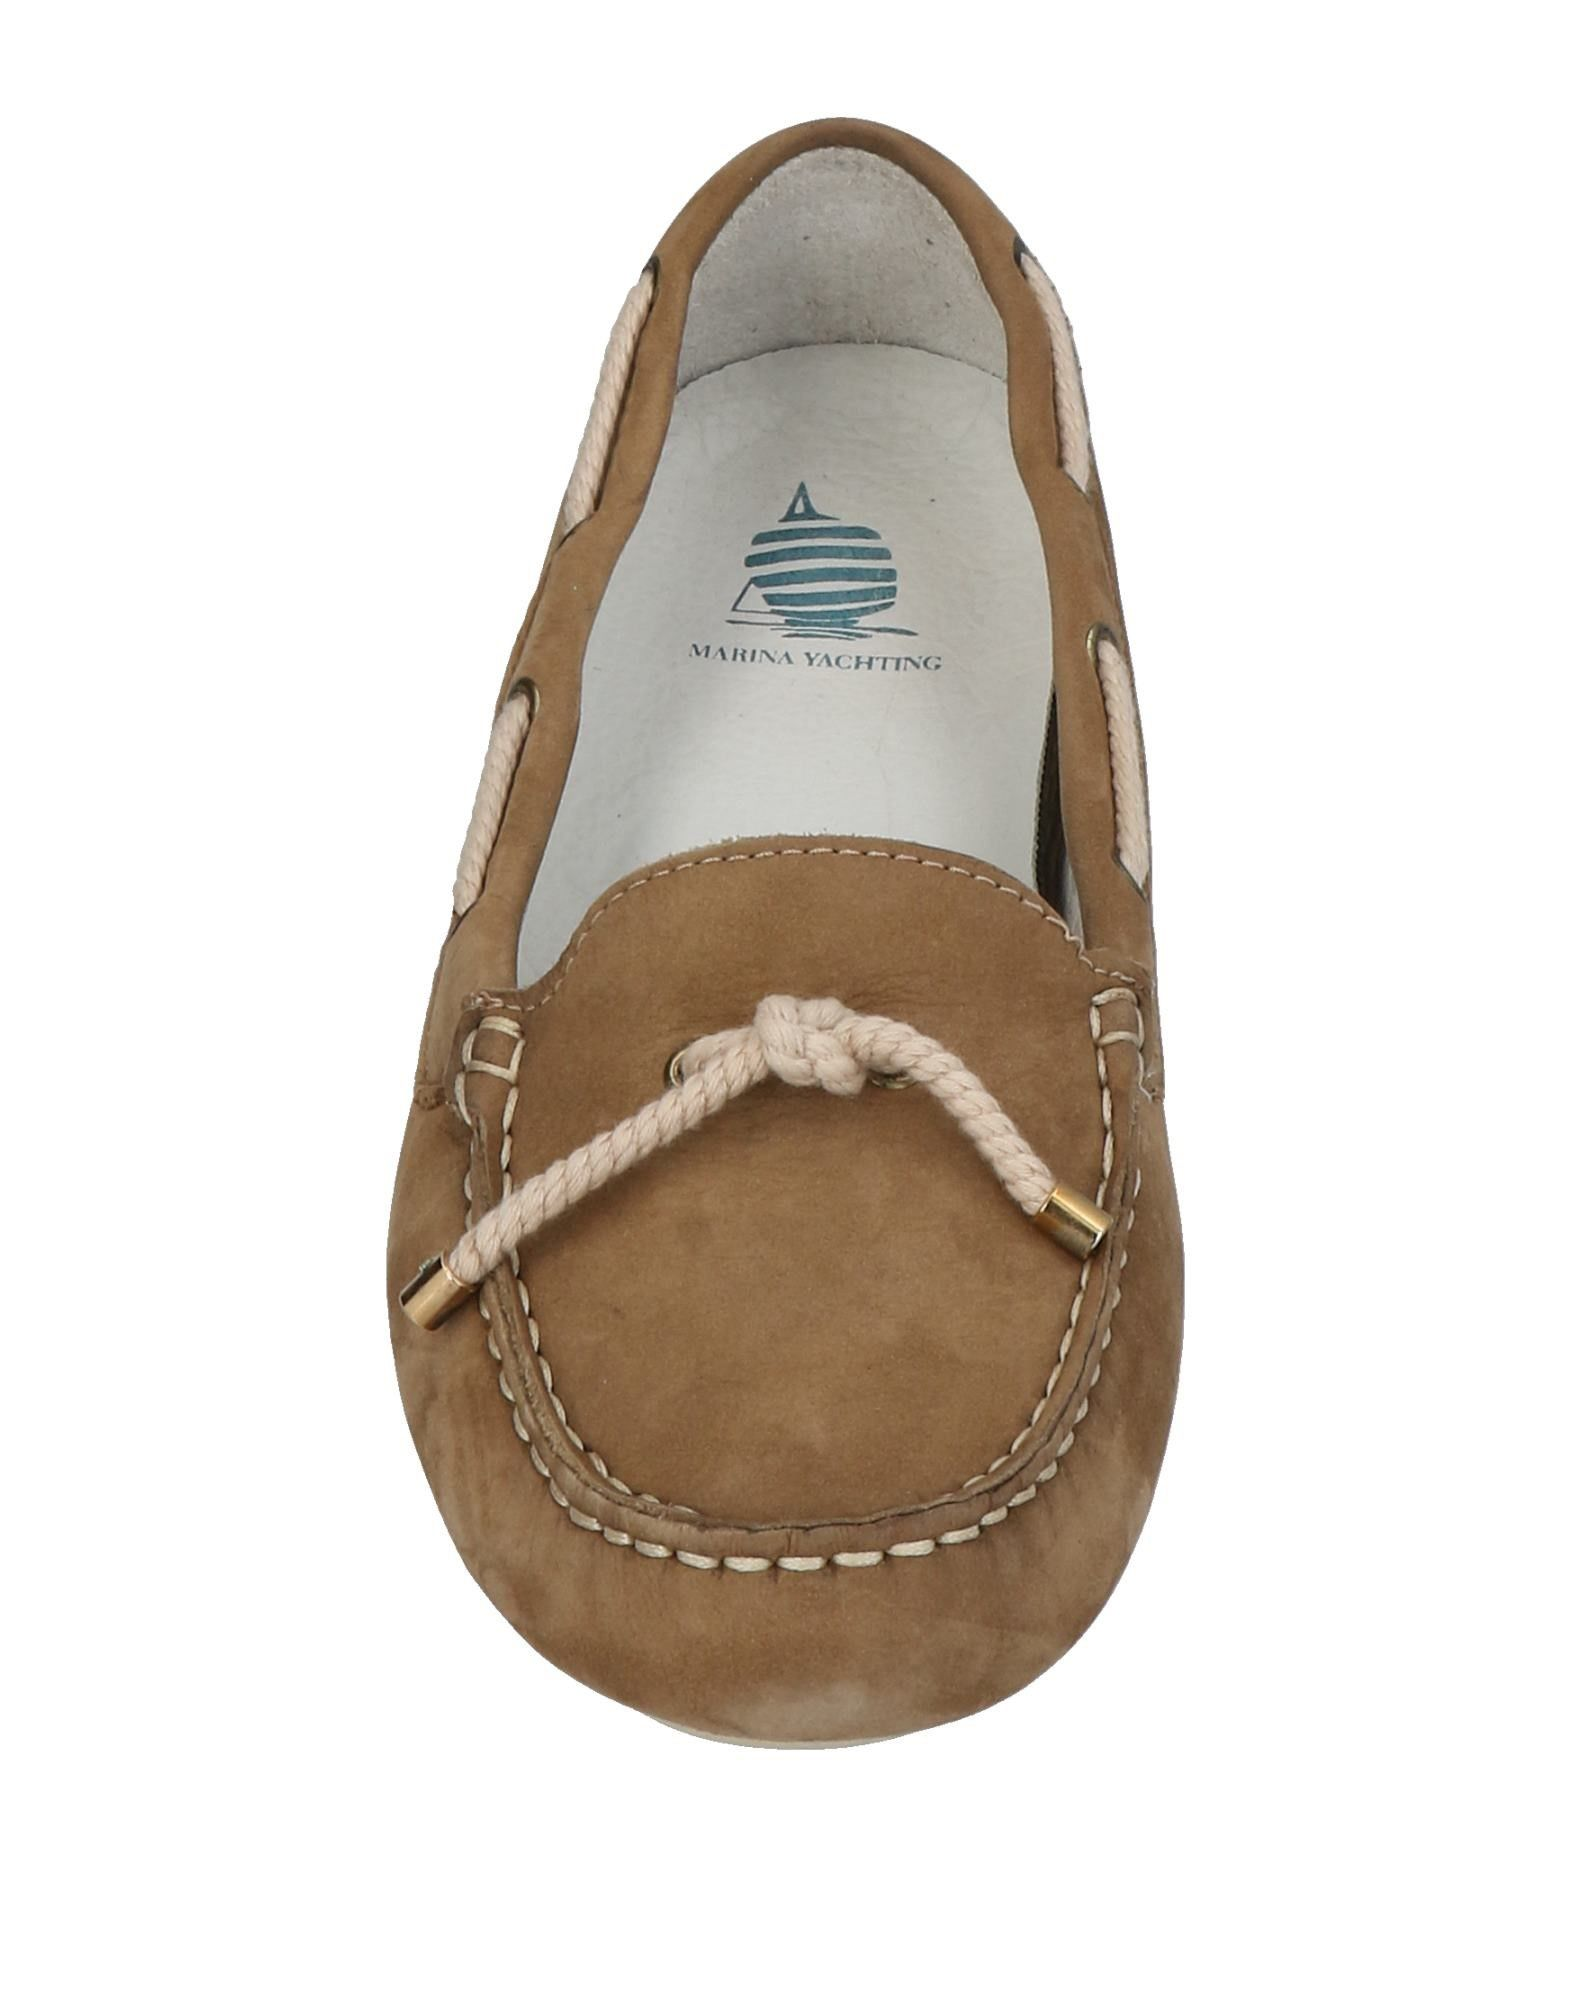 Marina Yachting Mocassins Femme.  Noir (Blk) Dr. Martens 1461 FL W chaussures white  Baskets Basses Homme 5Gy3l